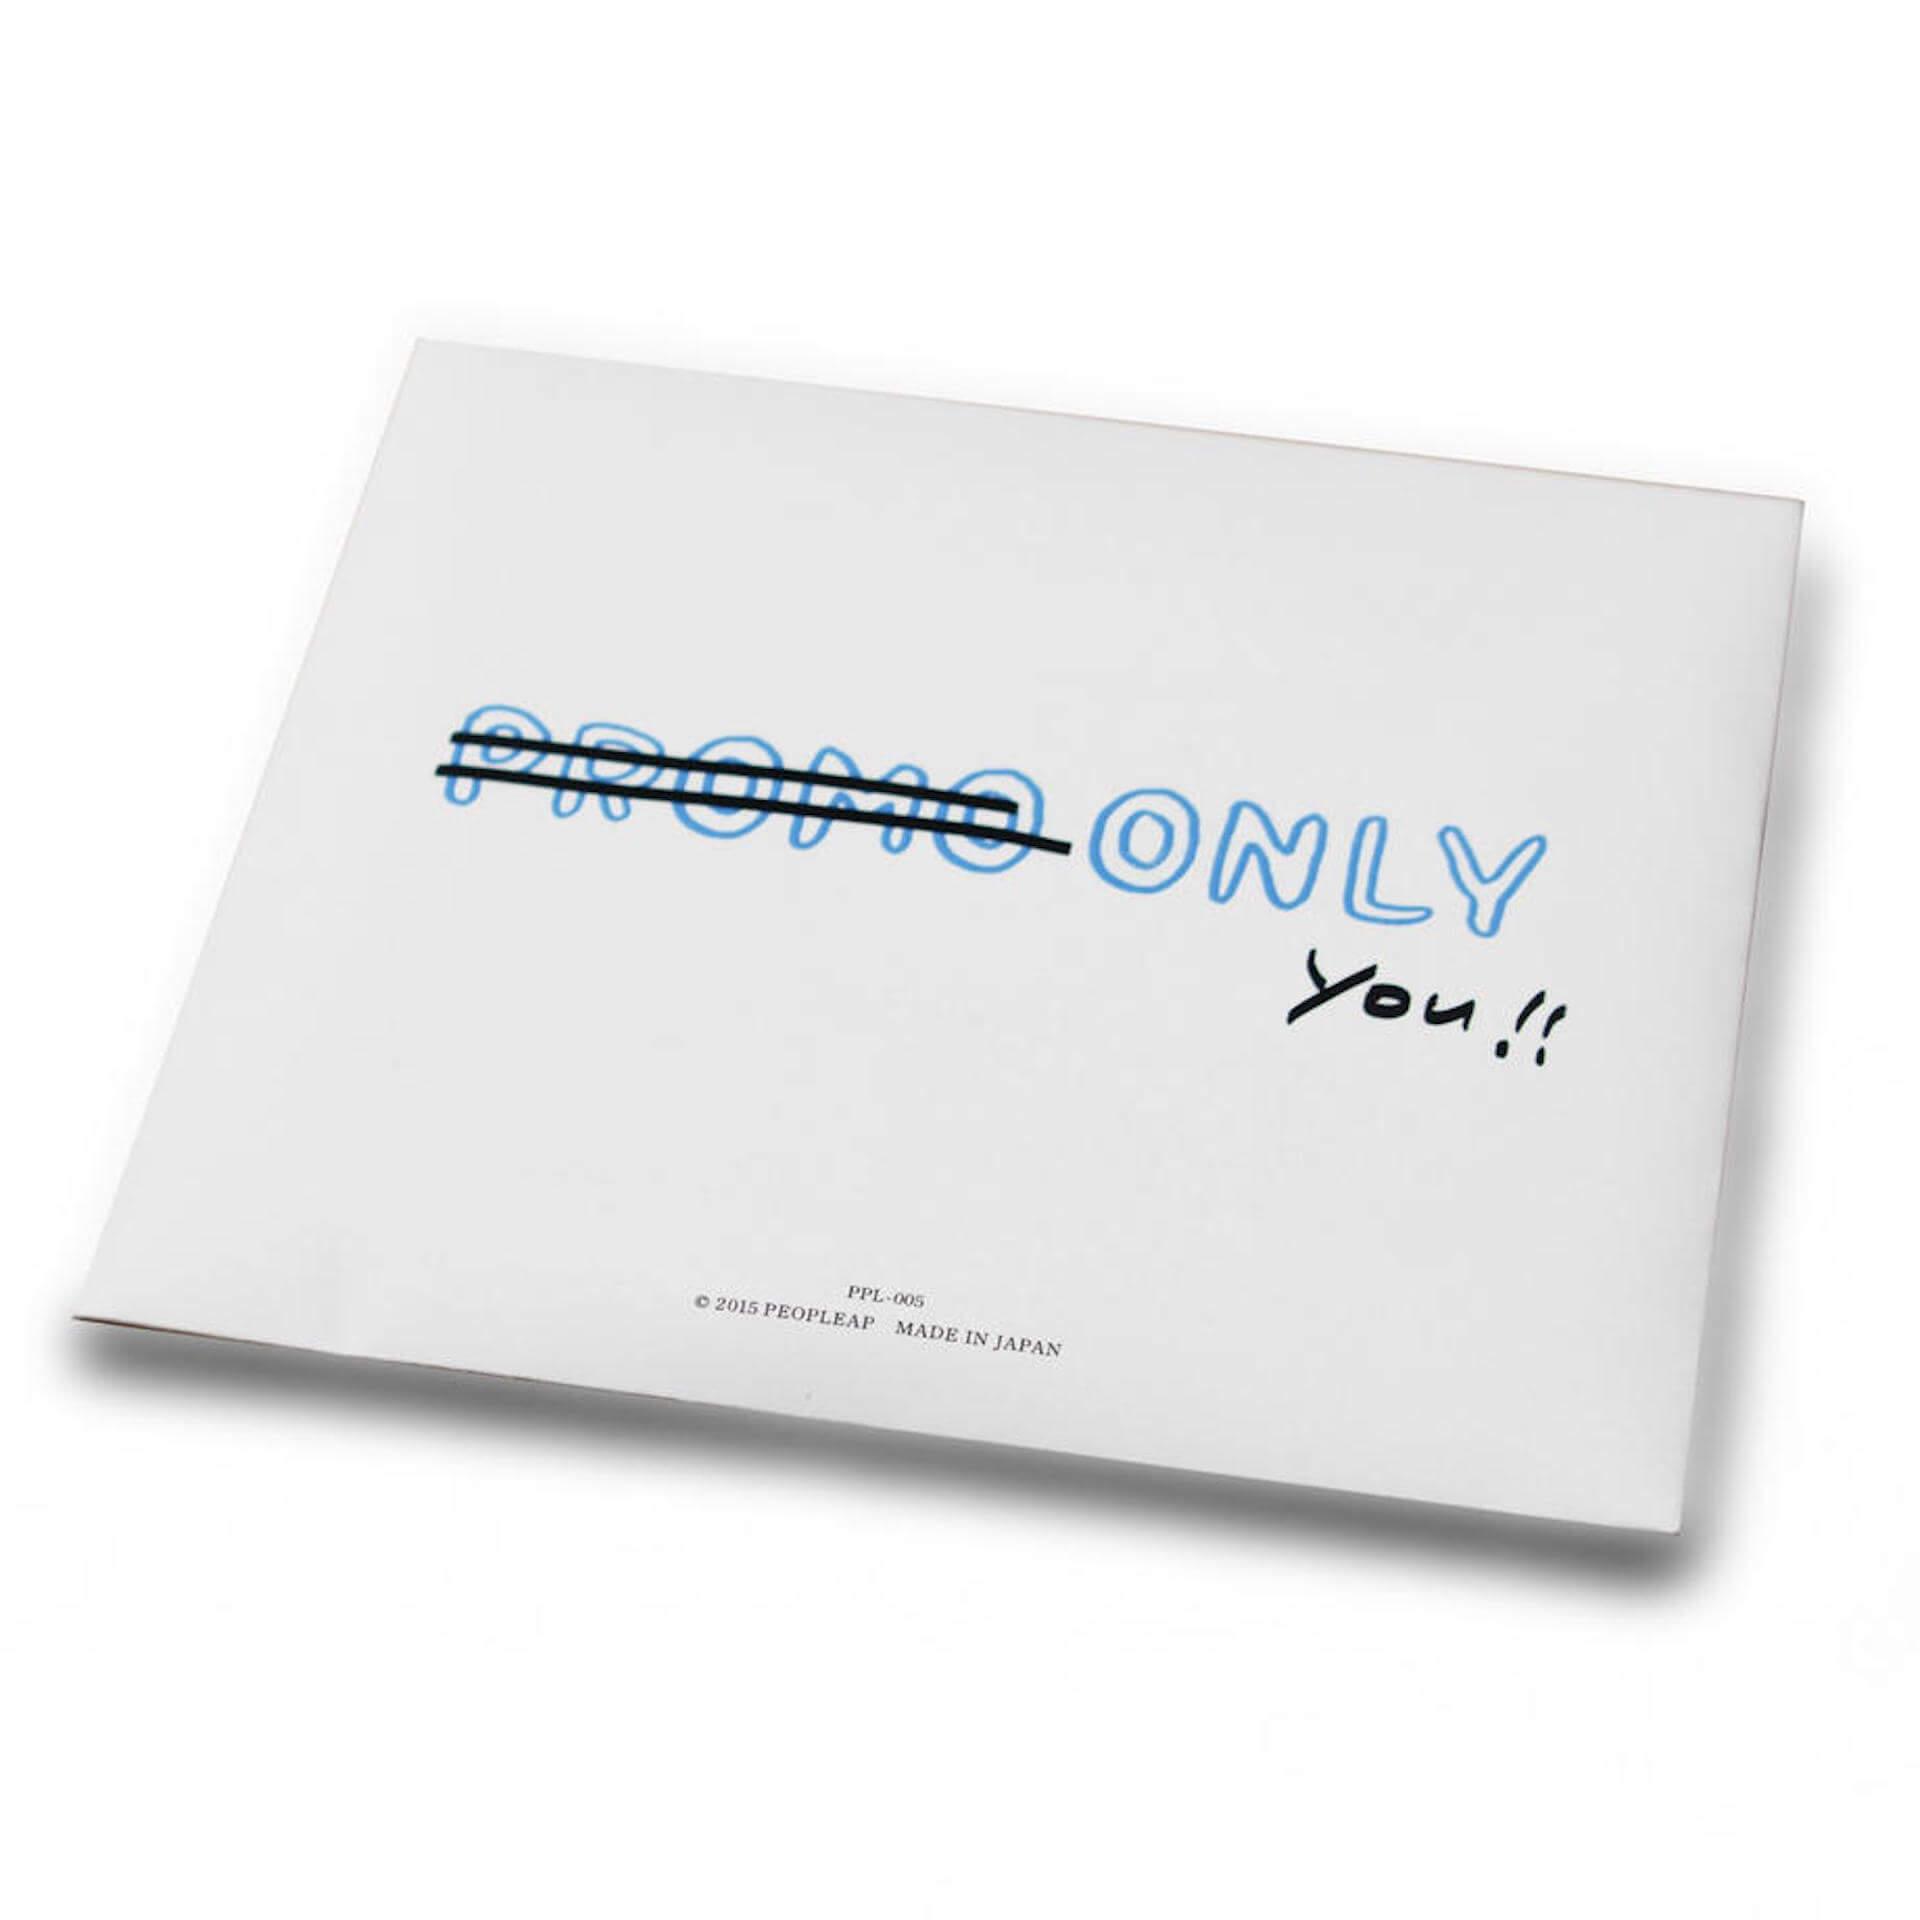 PEOPLEAPのレコード皿がつなぐモノ・ヒト・地域の表現力 interview210628_peopleap_14